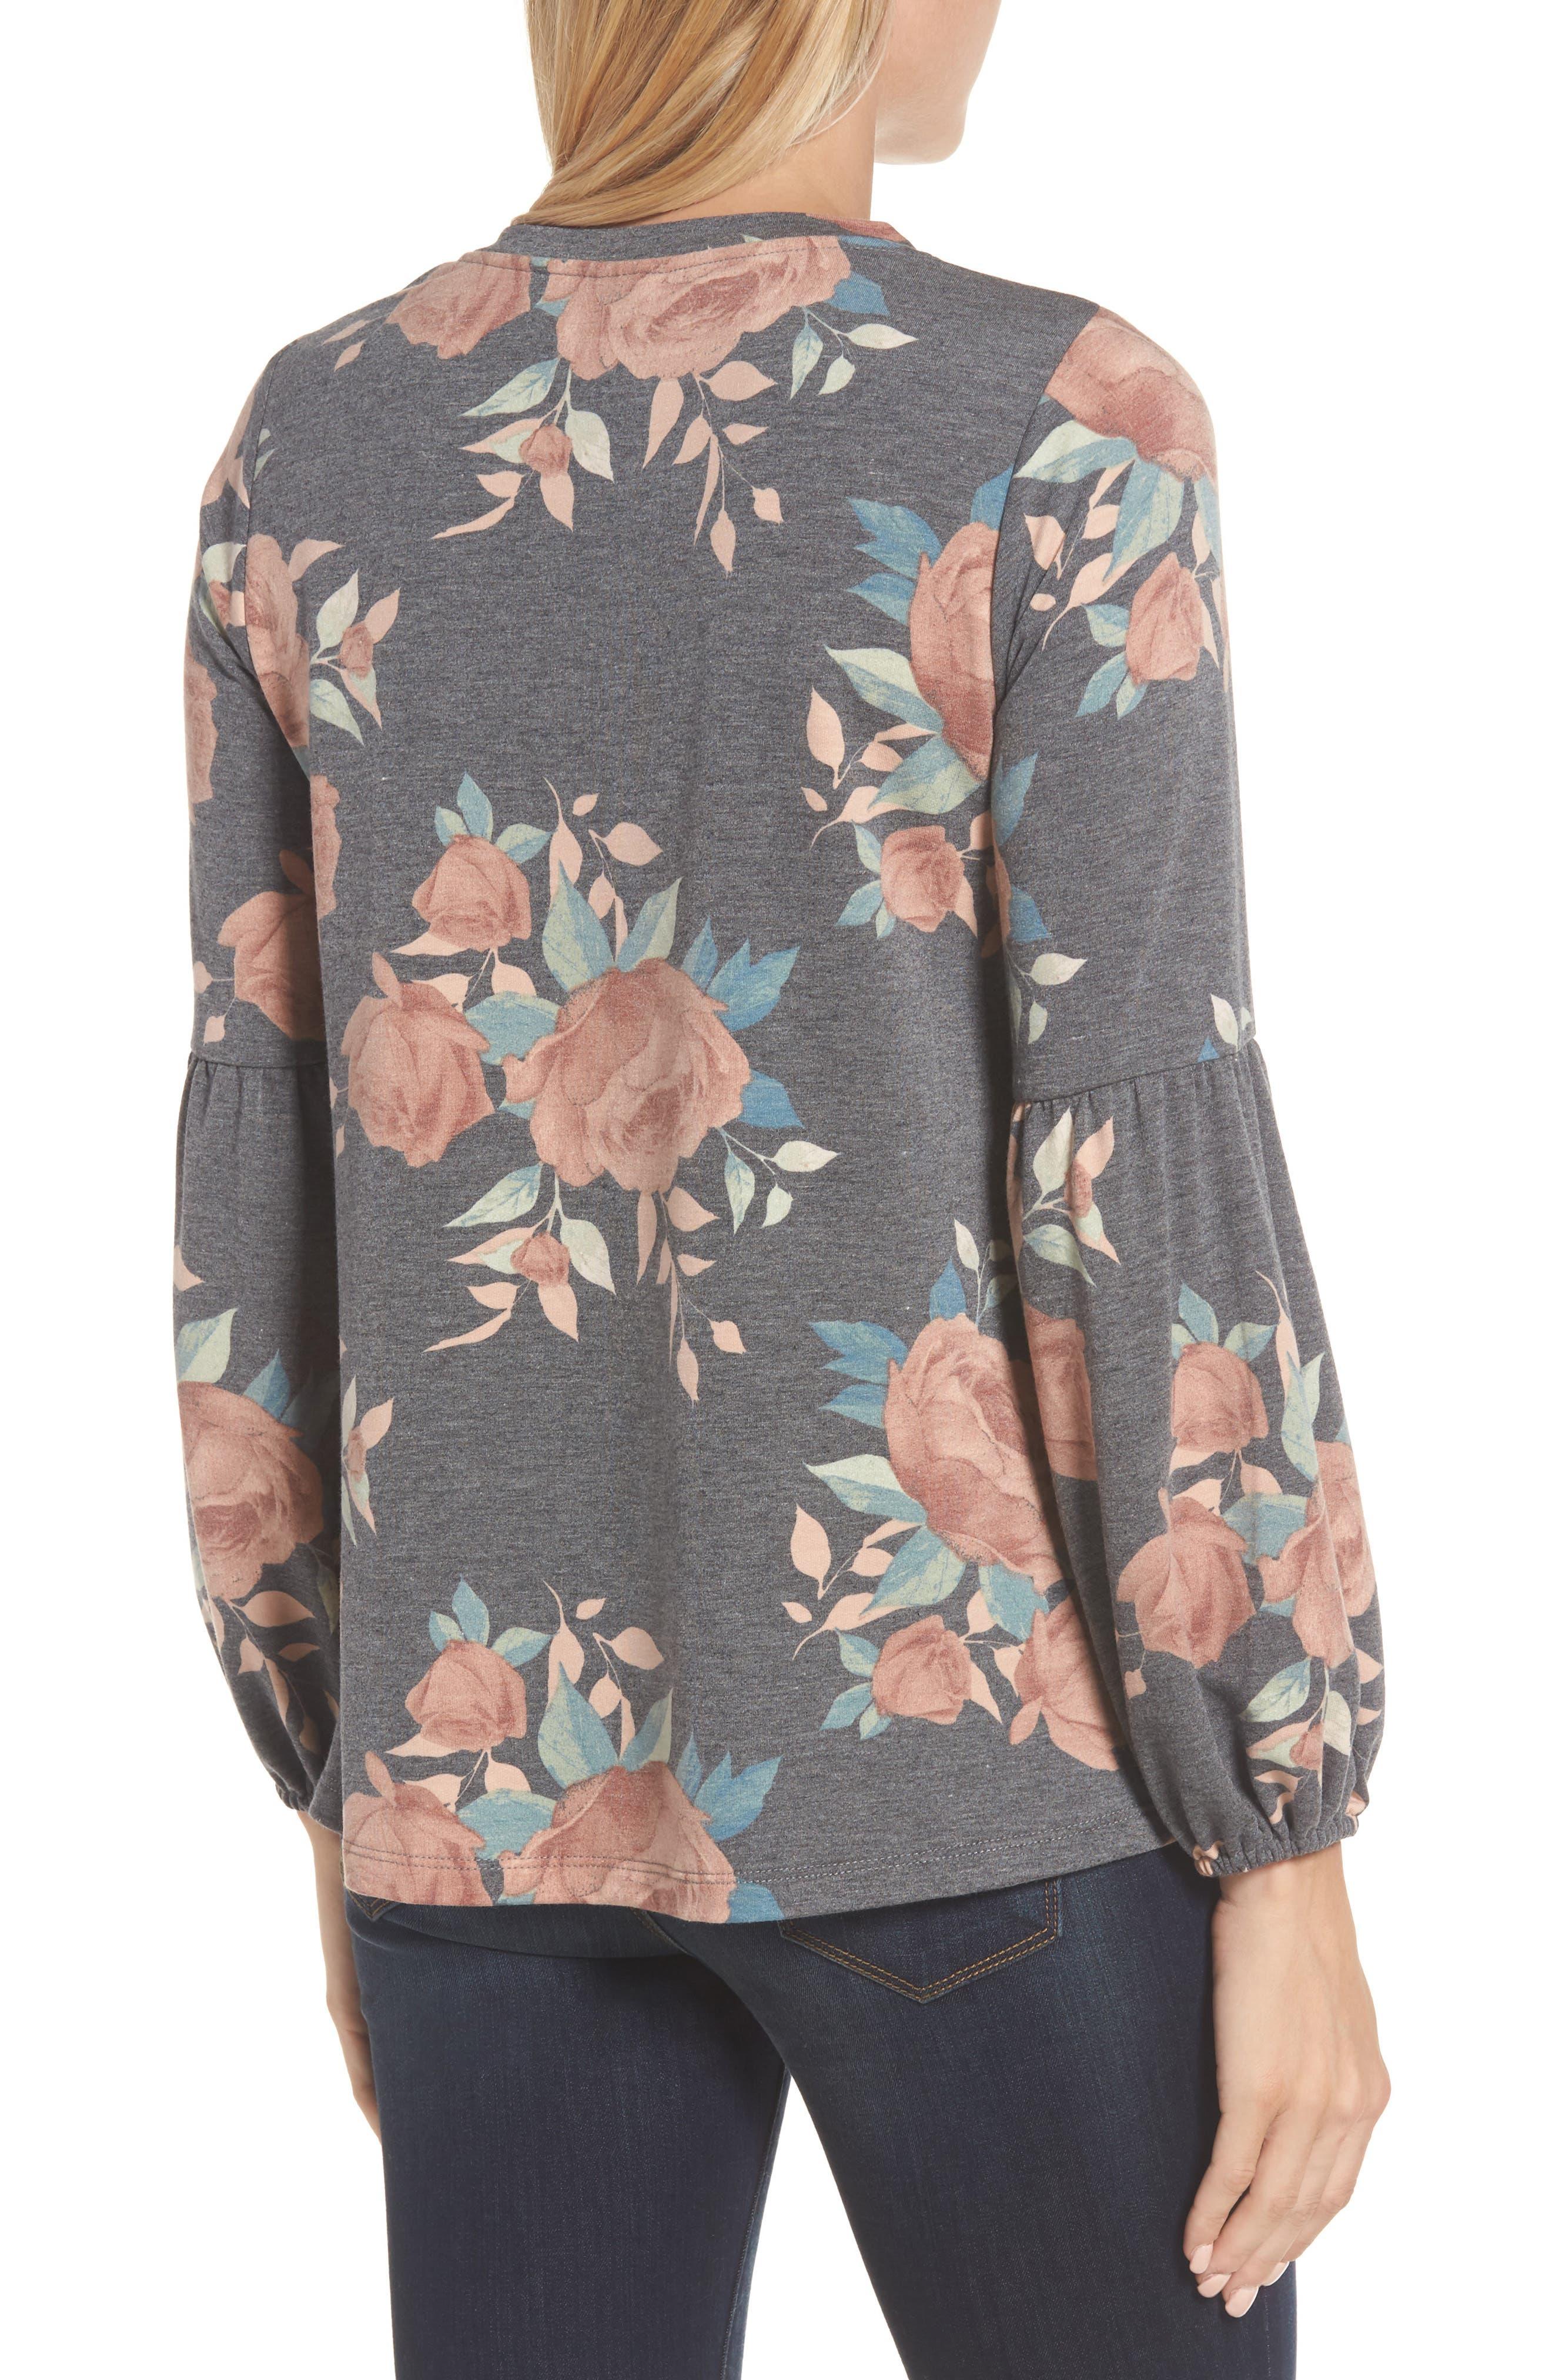 Floral Print Balloon Sleeve Sweatshirt,                             Alternate thumbnail 2, color,                             Black/ Blush